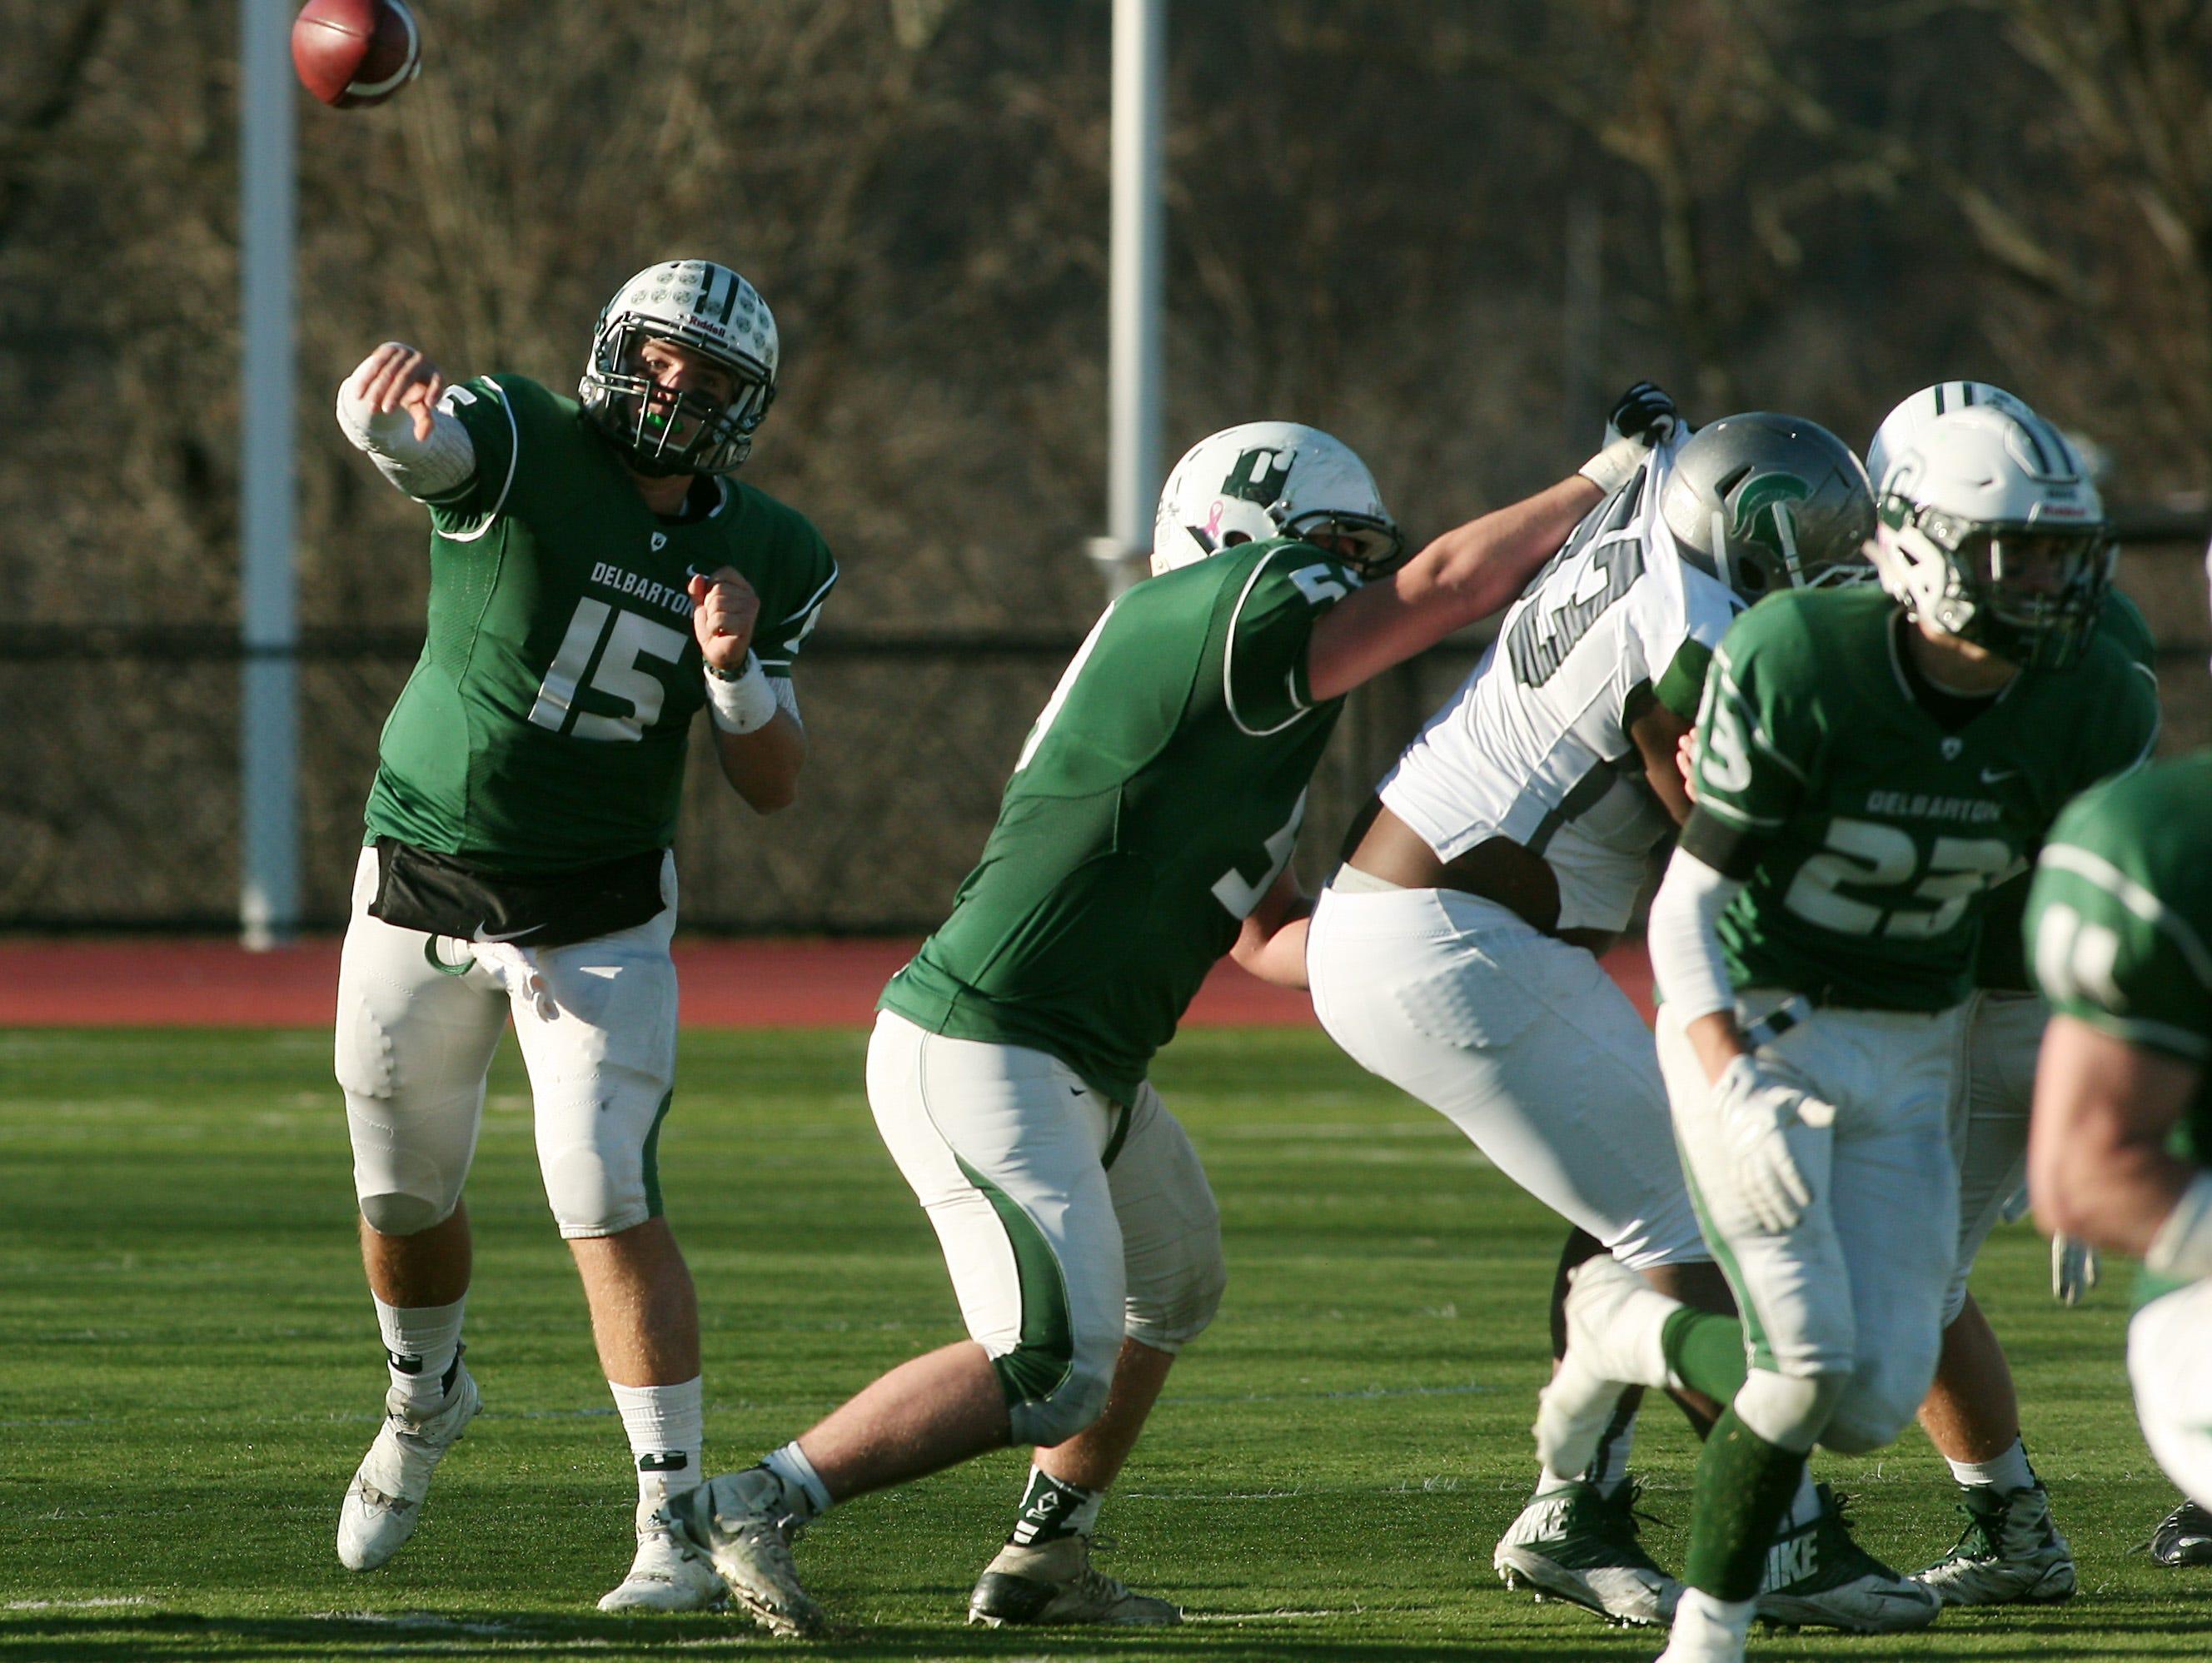 Delbarton quarterback Matt Zebrowski throws vs. DePaul in the NJSIAA Non-Public Group III semifinal. November 21, 2015, Morristown, NJ.